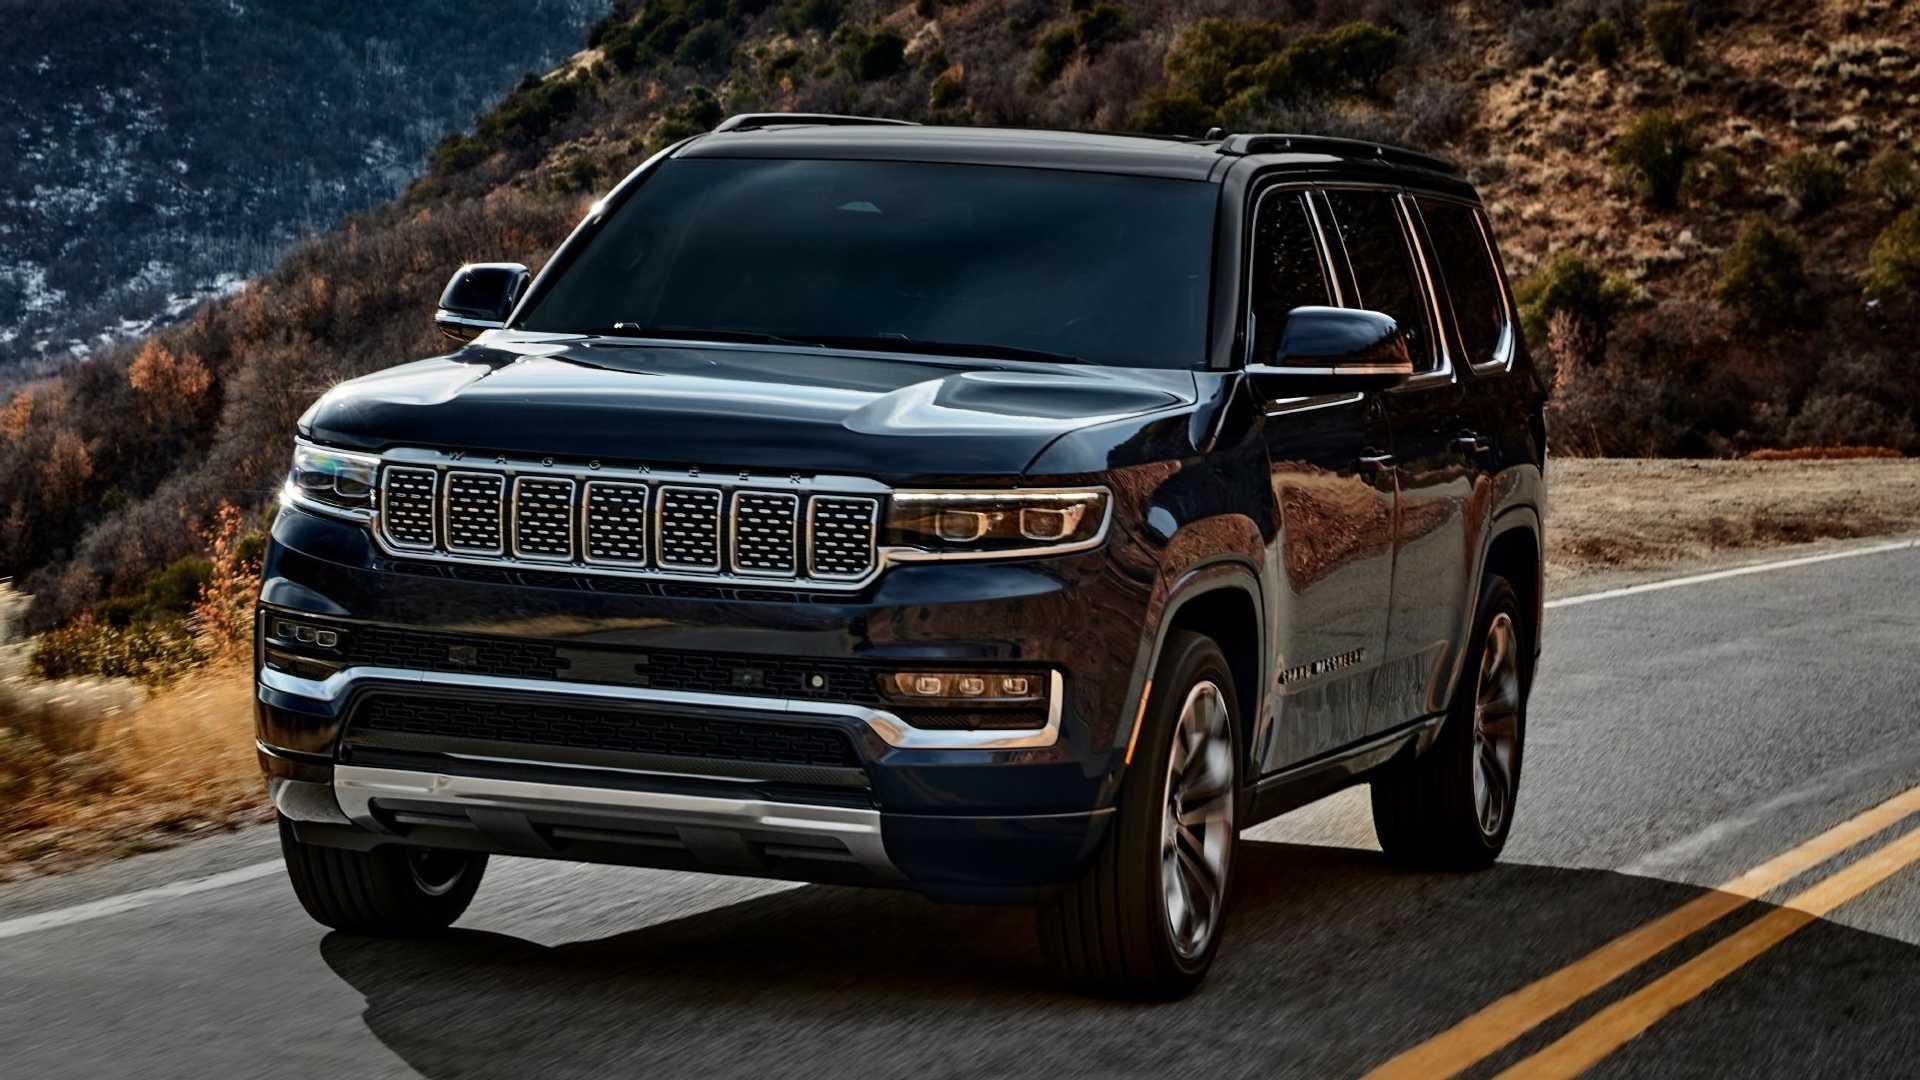 2022-jeep-grand-wagoneer-exterior-front-quarter-3